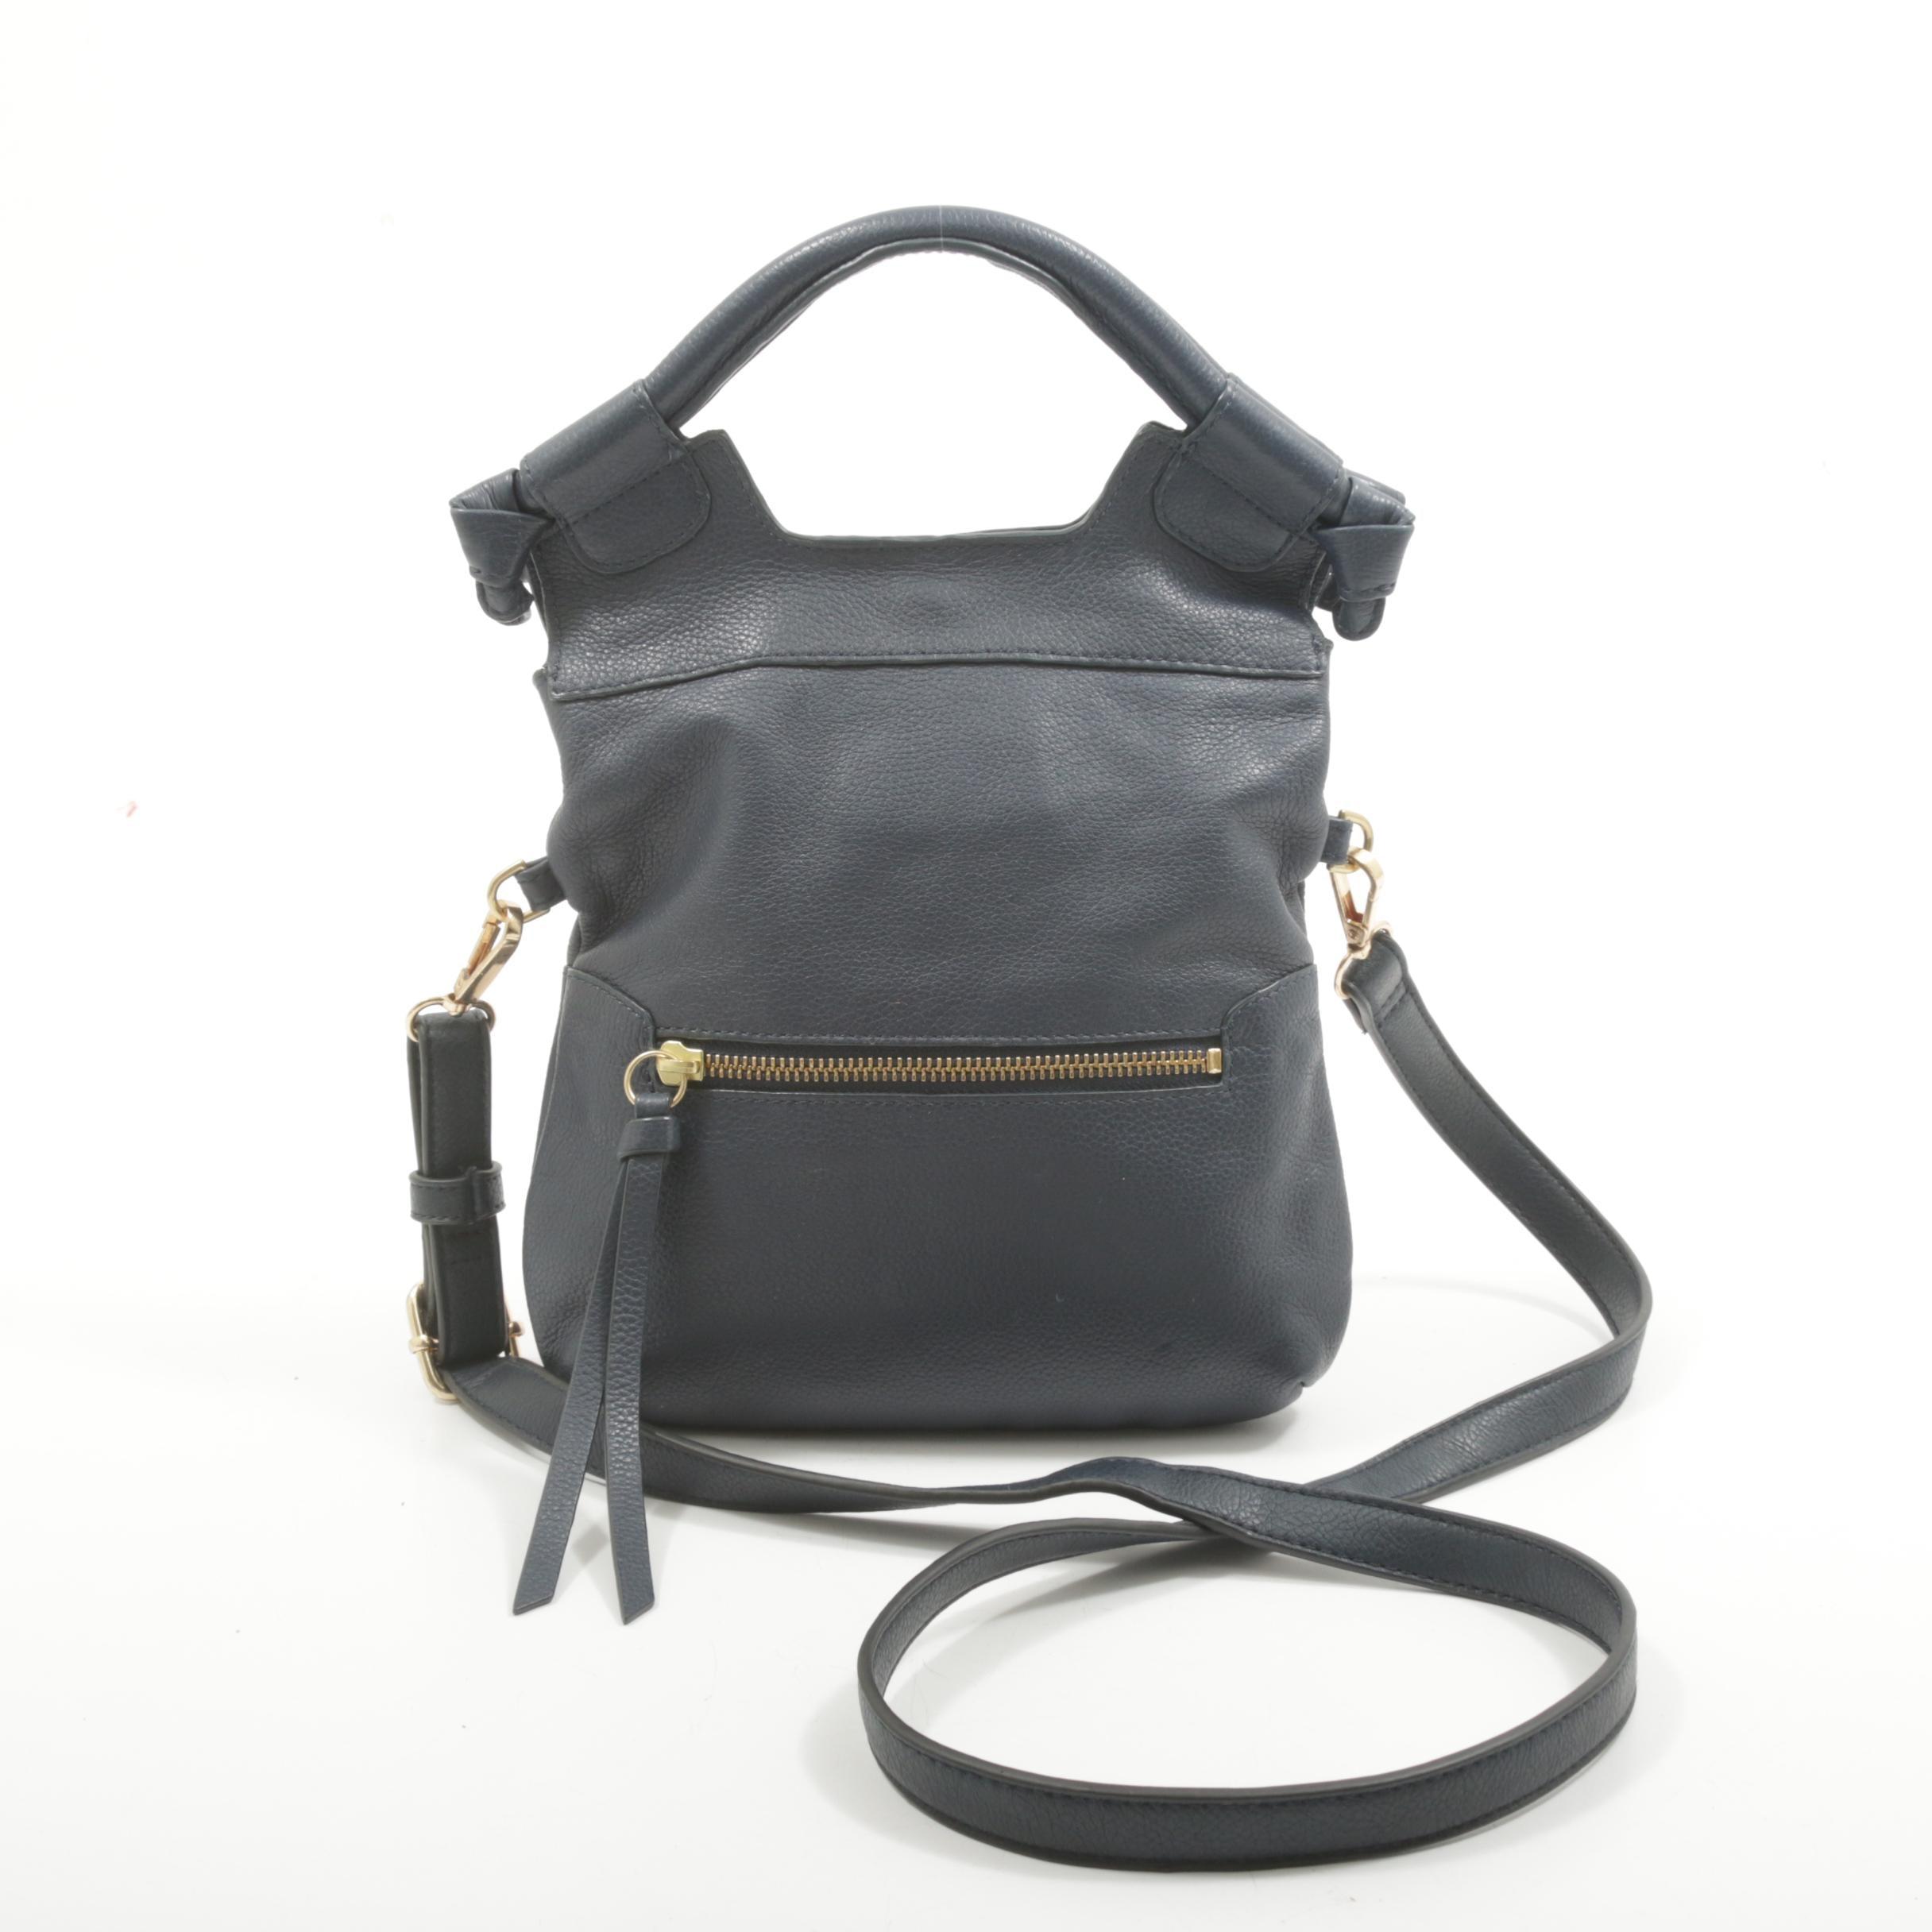 Foley + Corinna Navy Blue Grained Leather Crossbody Handbag